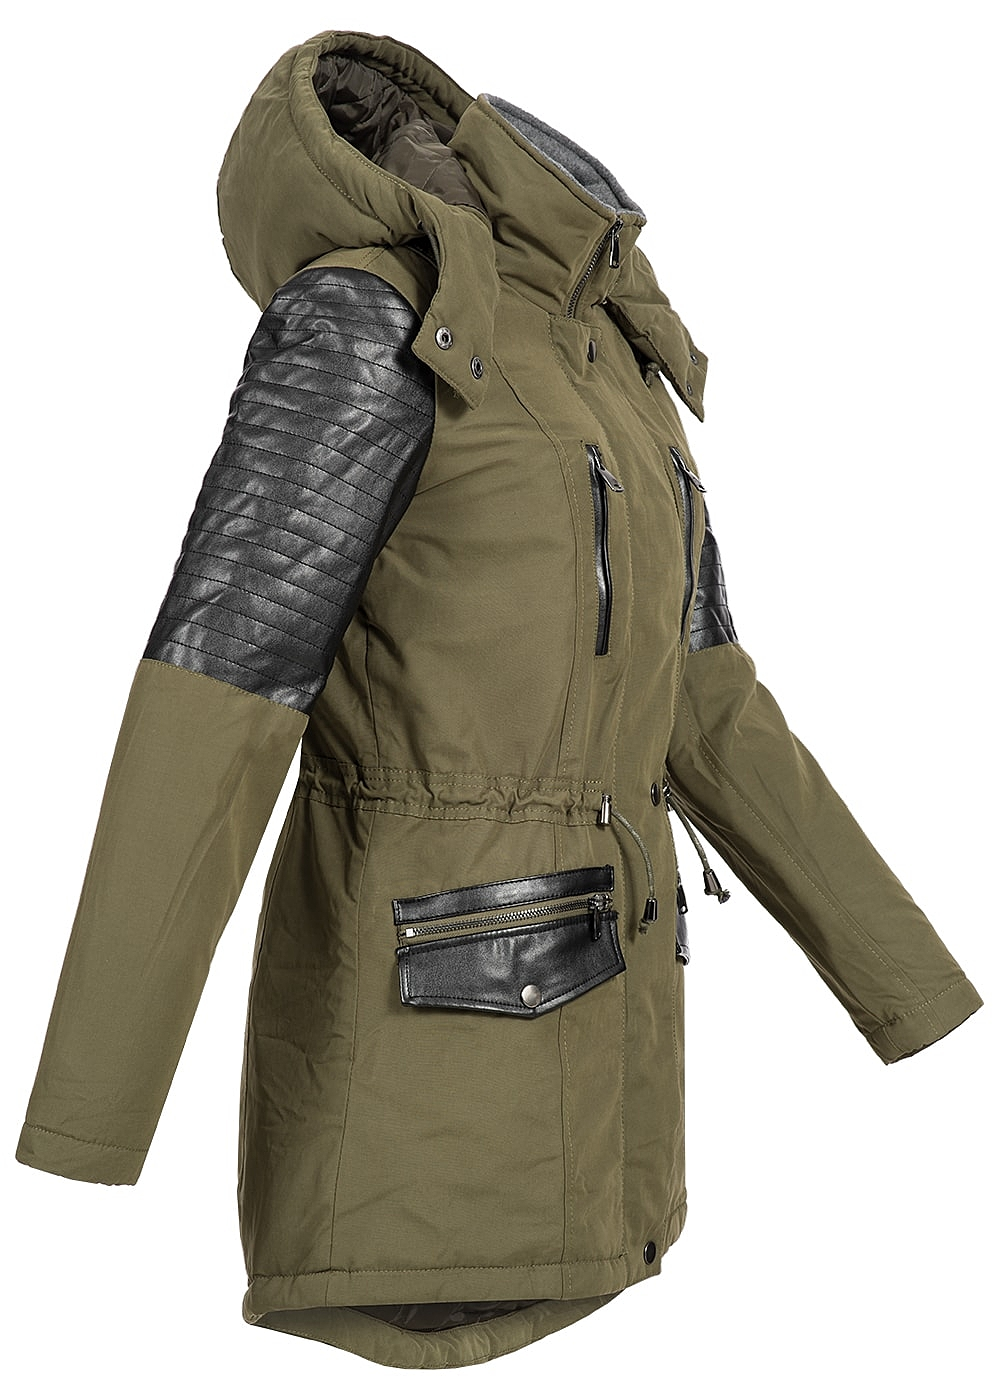 Seventyseven Lifestyle Damen Winter Jacke Kunstleder Kapuze olive ... 3bb4017d75c